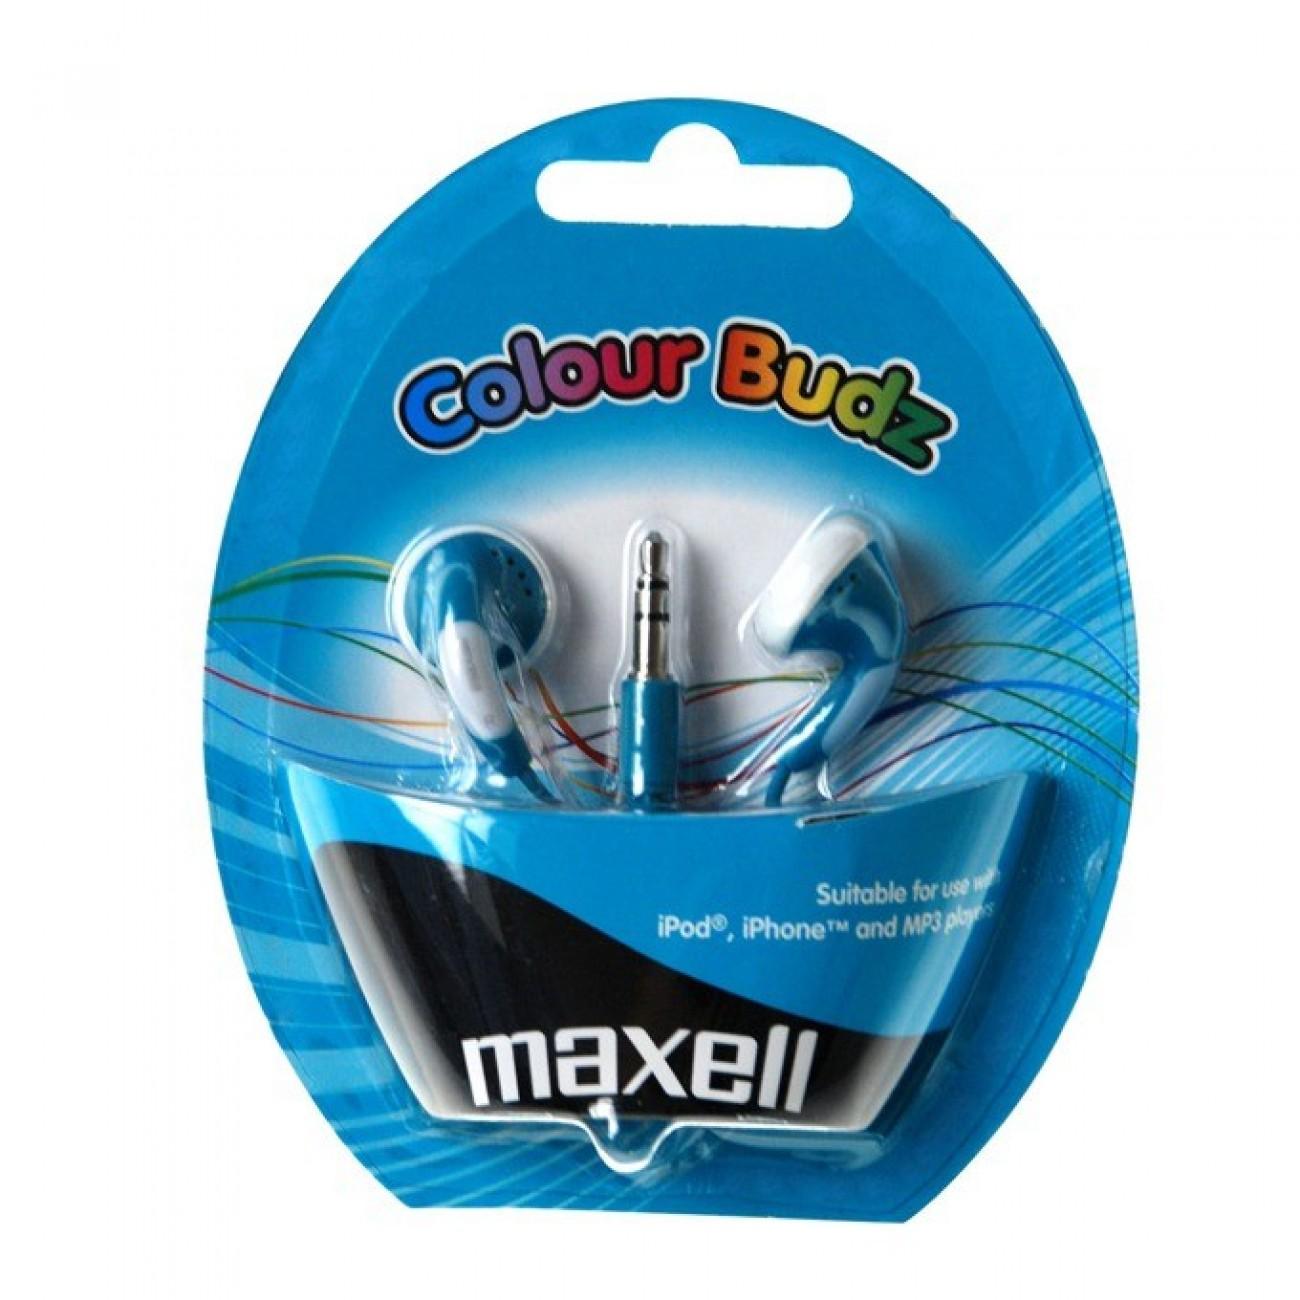 Слушалки MAXELL color BUDS, сини, тапи в Слушалки -    Alleop